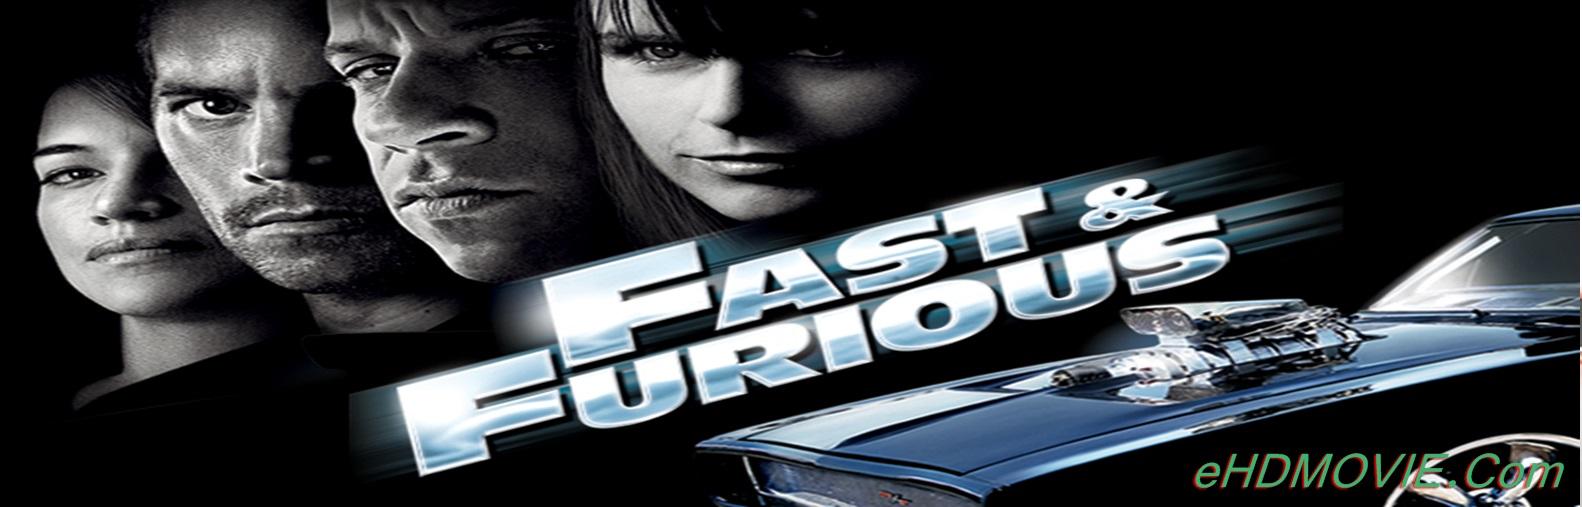 Fast & Furious 2009 Full Movie Dual Audio [Hindi – English] 1080p - 720p - 480p ORG BRRip 350MB - 800MB - 5GB ESubs Free Download